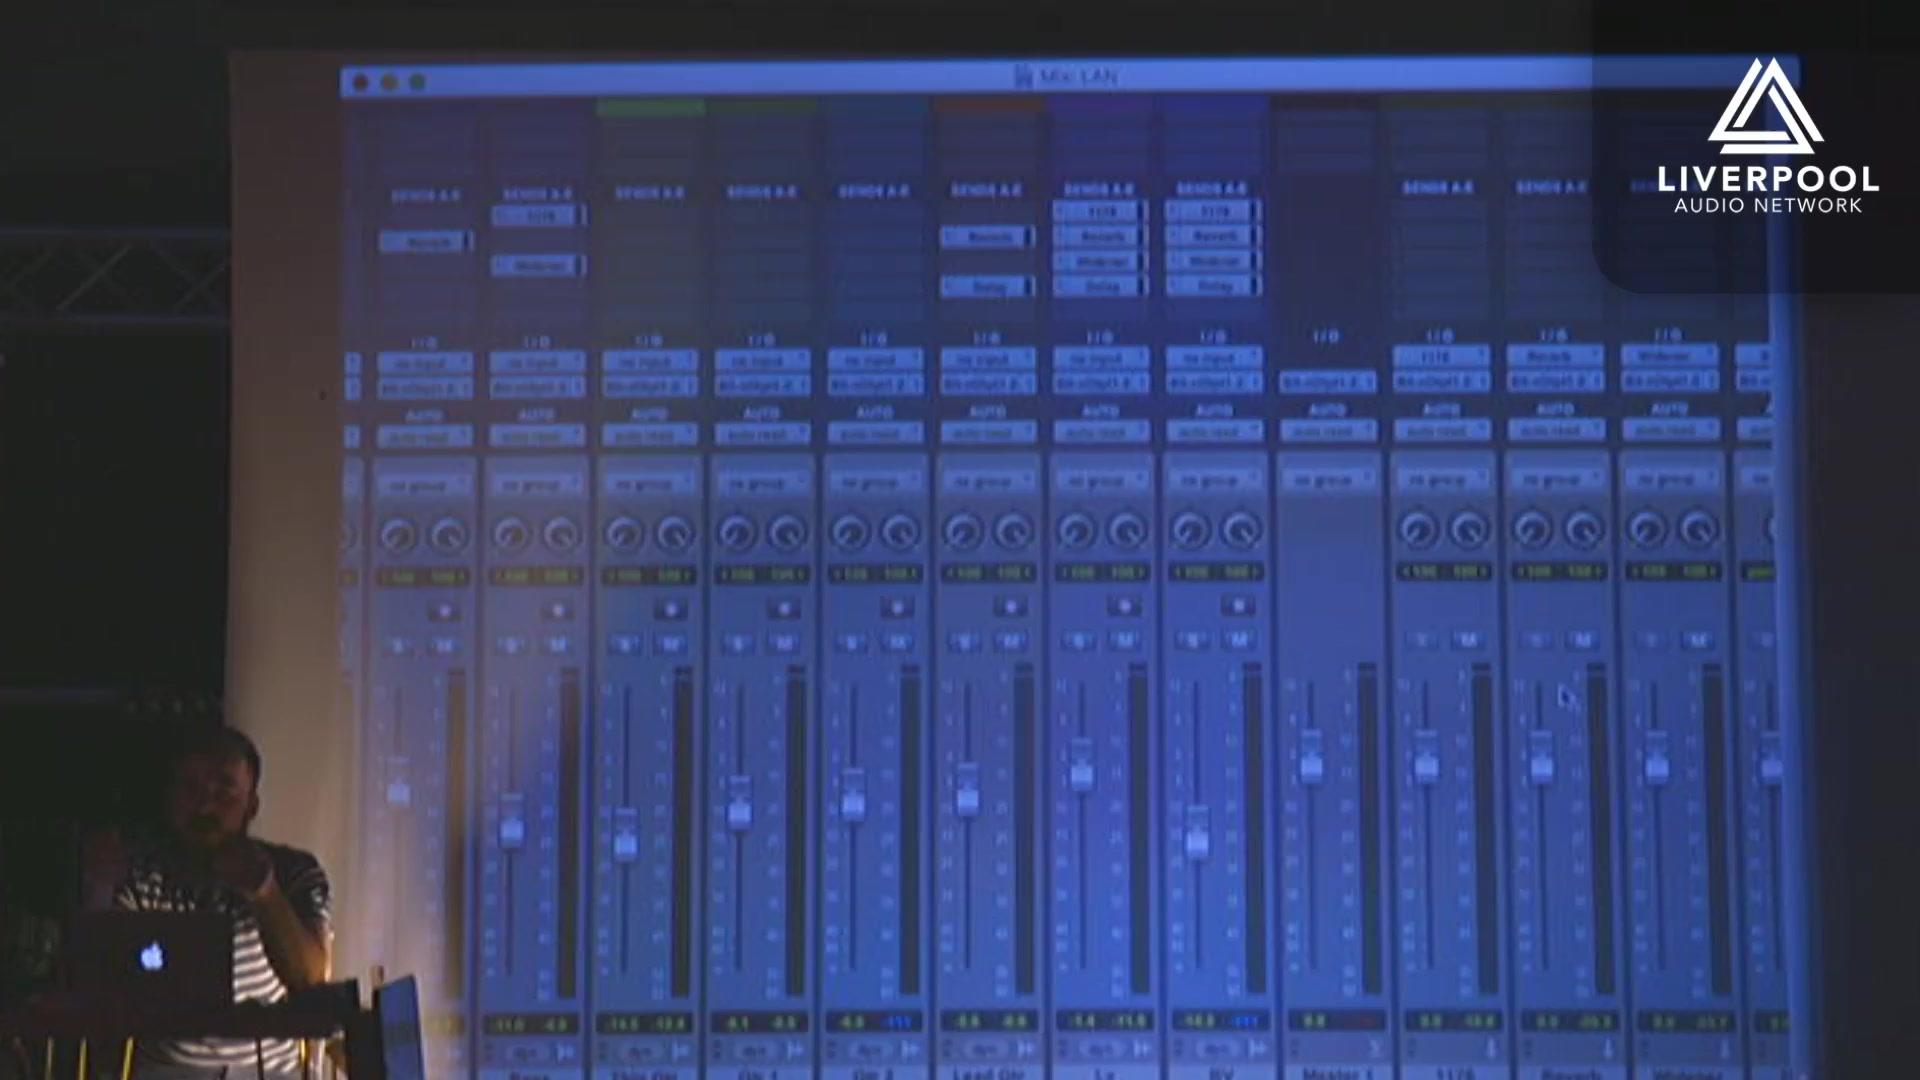 Al Groves: Mixing Masterclass